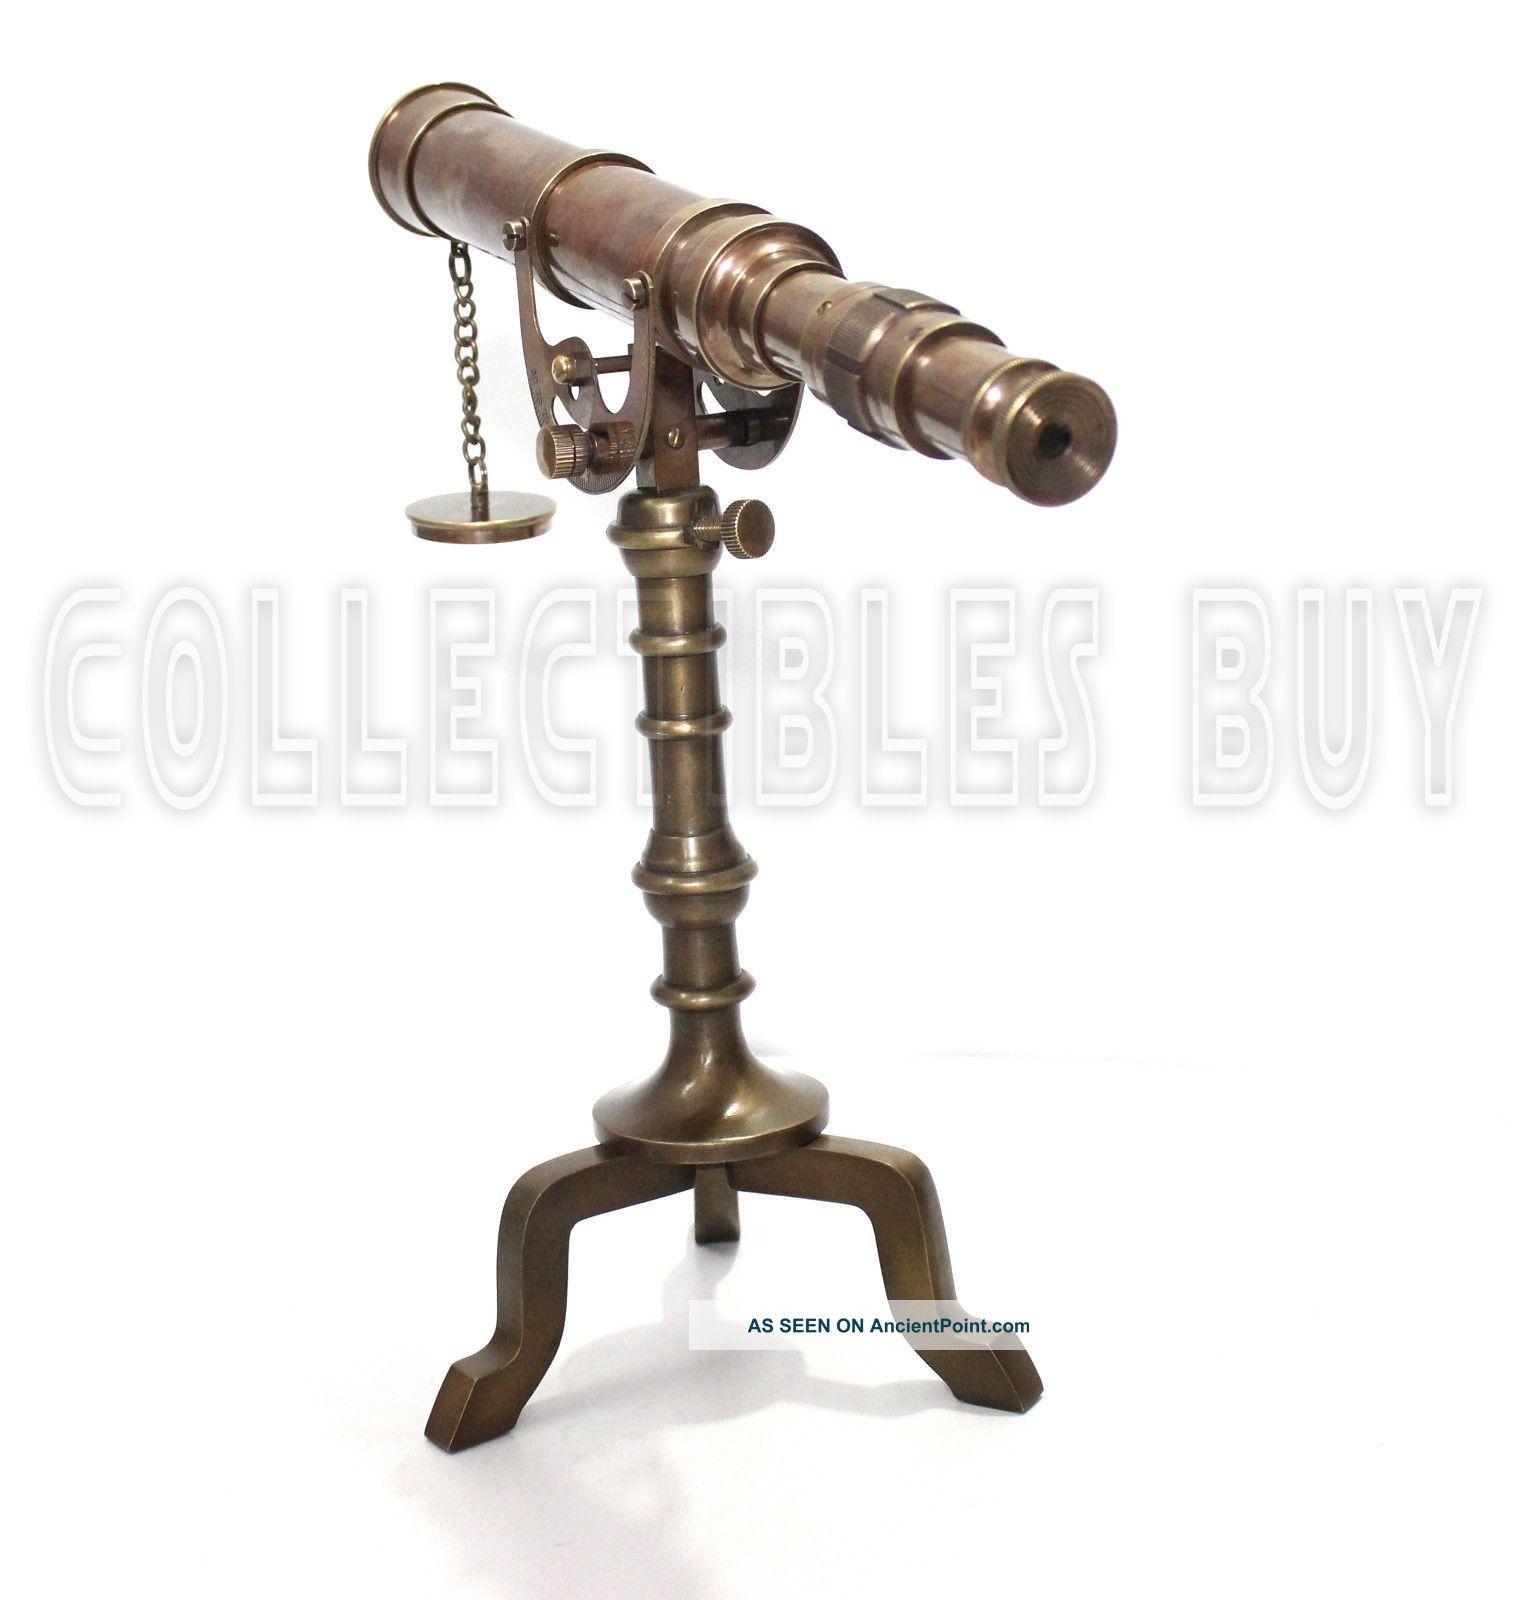 Nautical telescope Vintage Brass Tripod Desk Decorative Nautical Gift item Telescopes photo